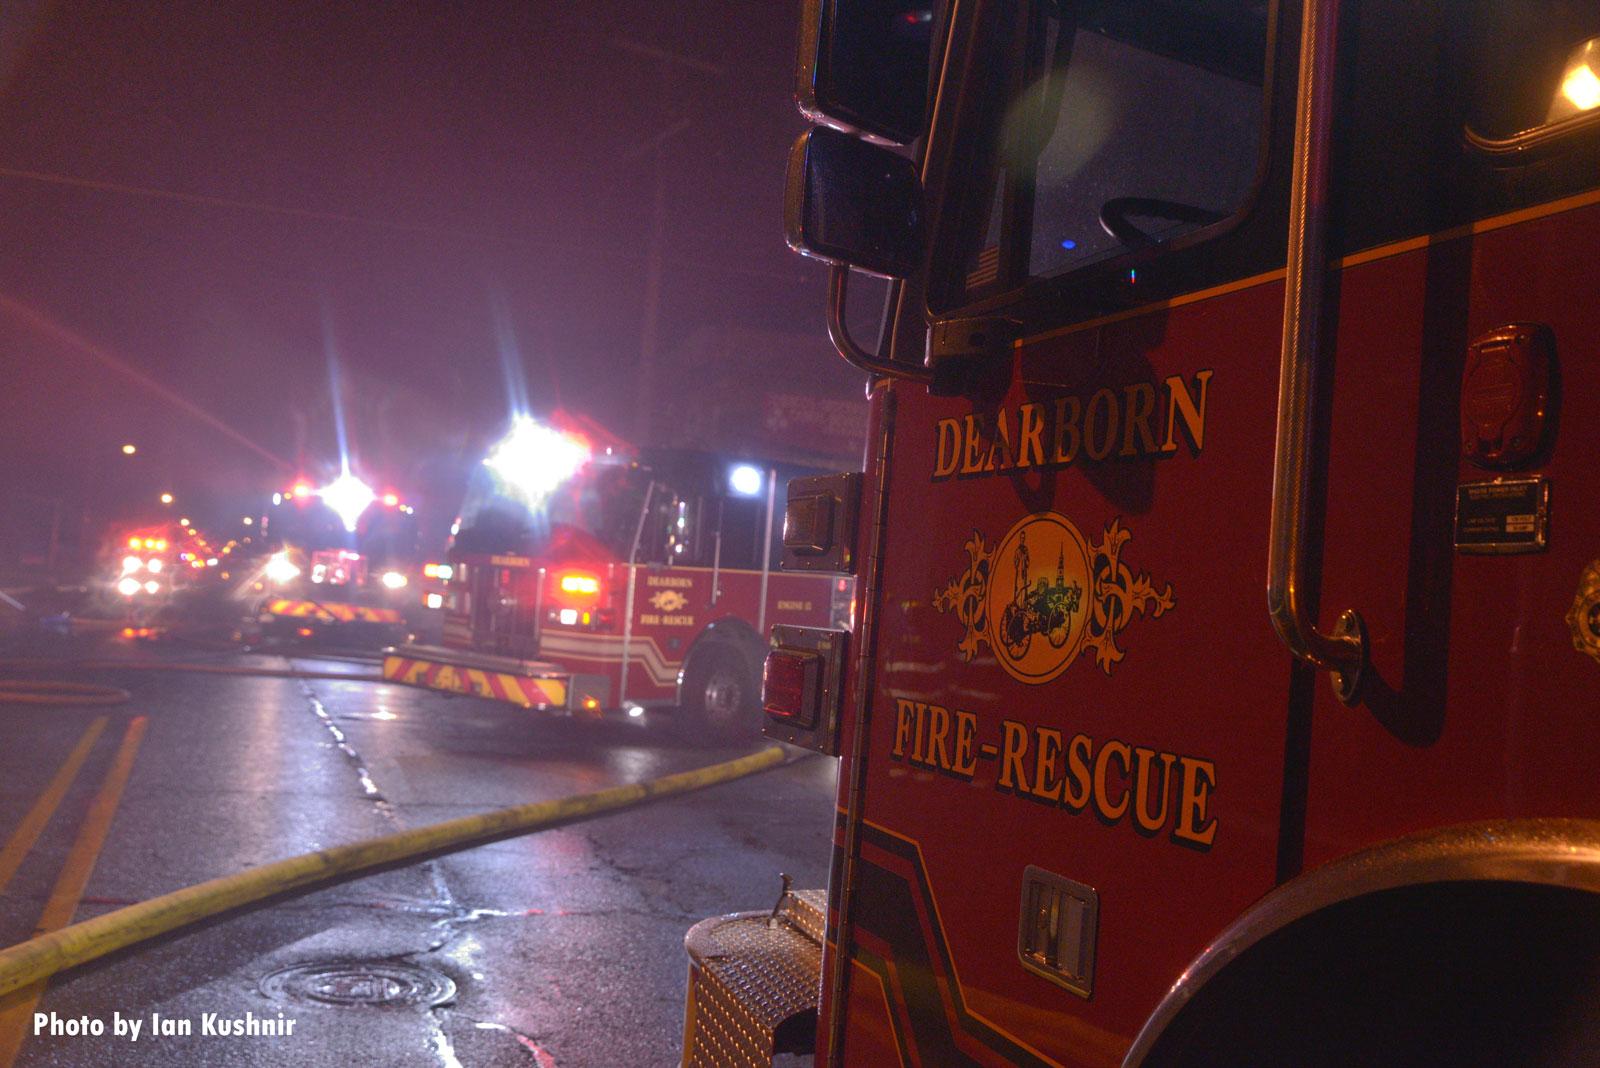 Several fire apparatus at the scene